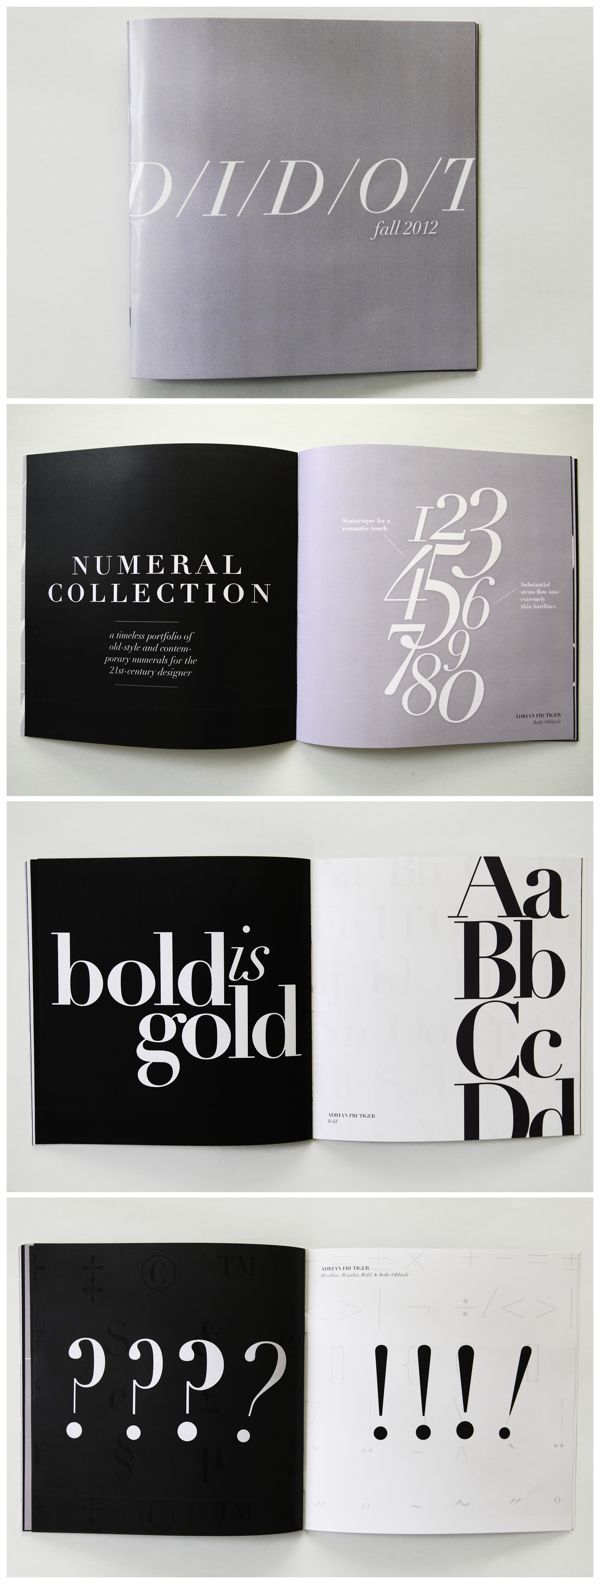 Me gusta la tipografía de la segunda foto, página en negro. Didot Type Specimen Booklet http://www.behance.net/...